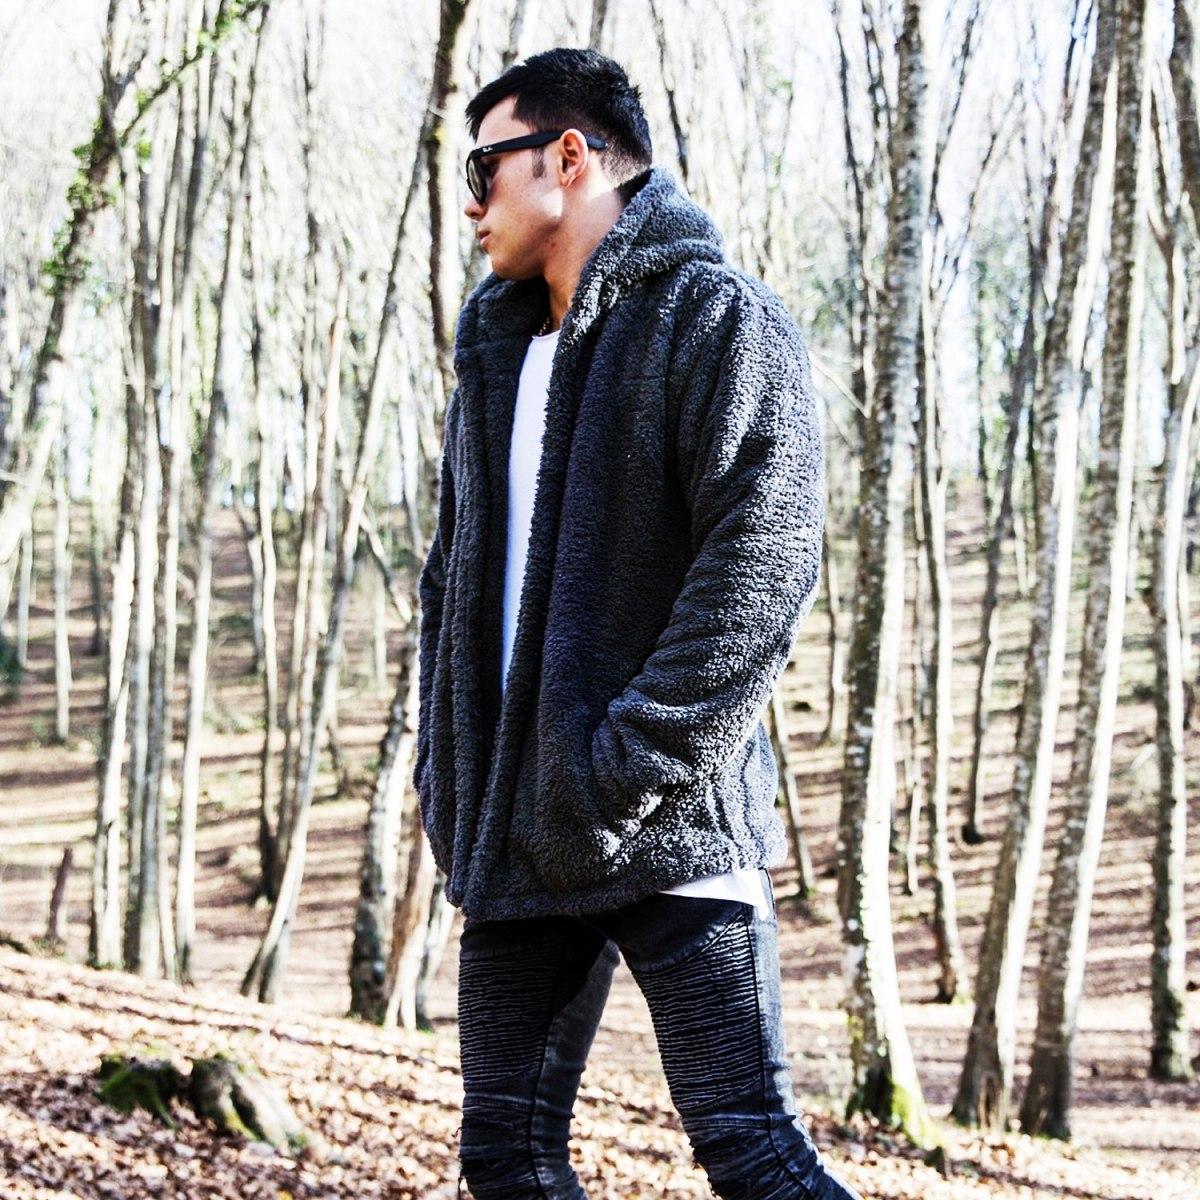 Men's Wellsoft Winter Furry Cardigan With Hood Black Mv Premium Brand - 2